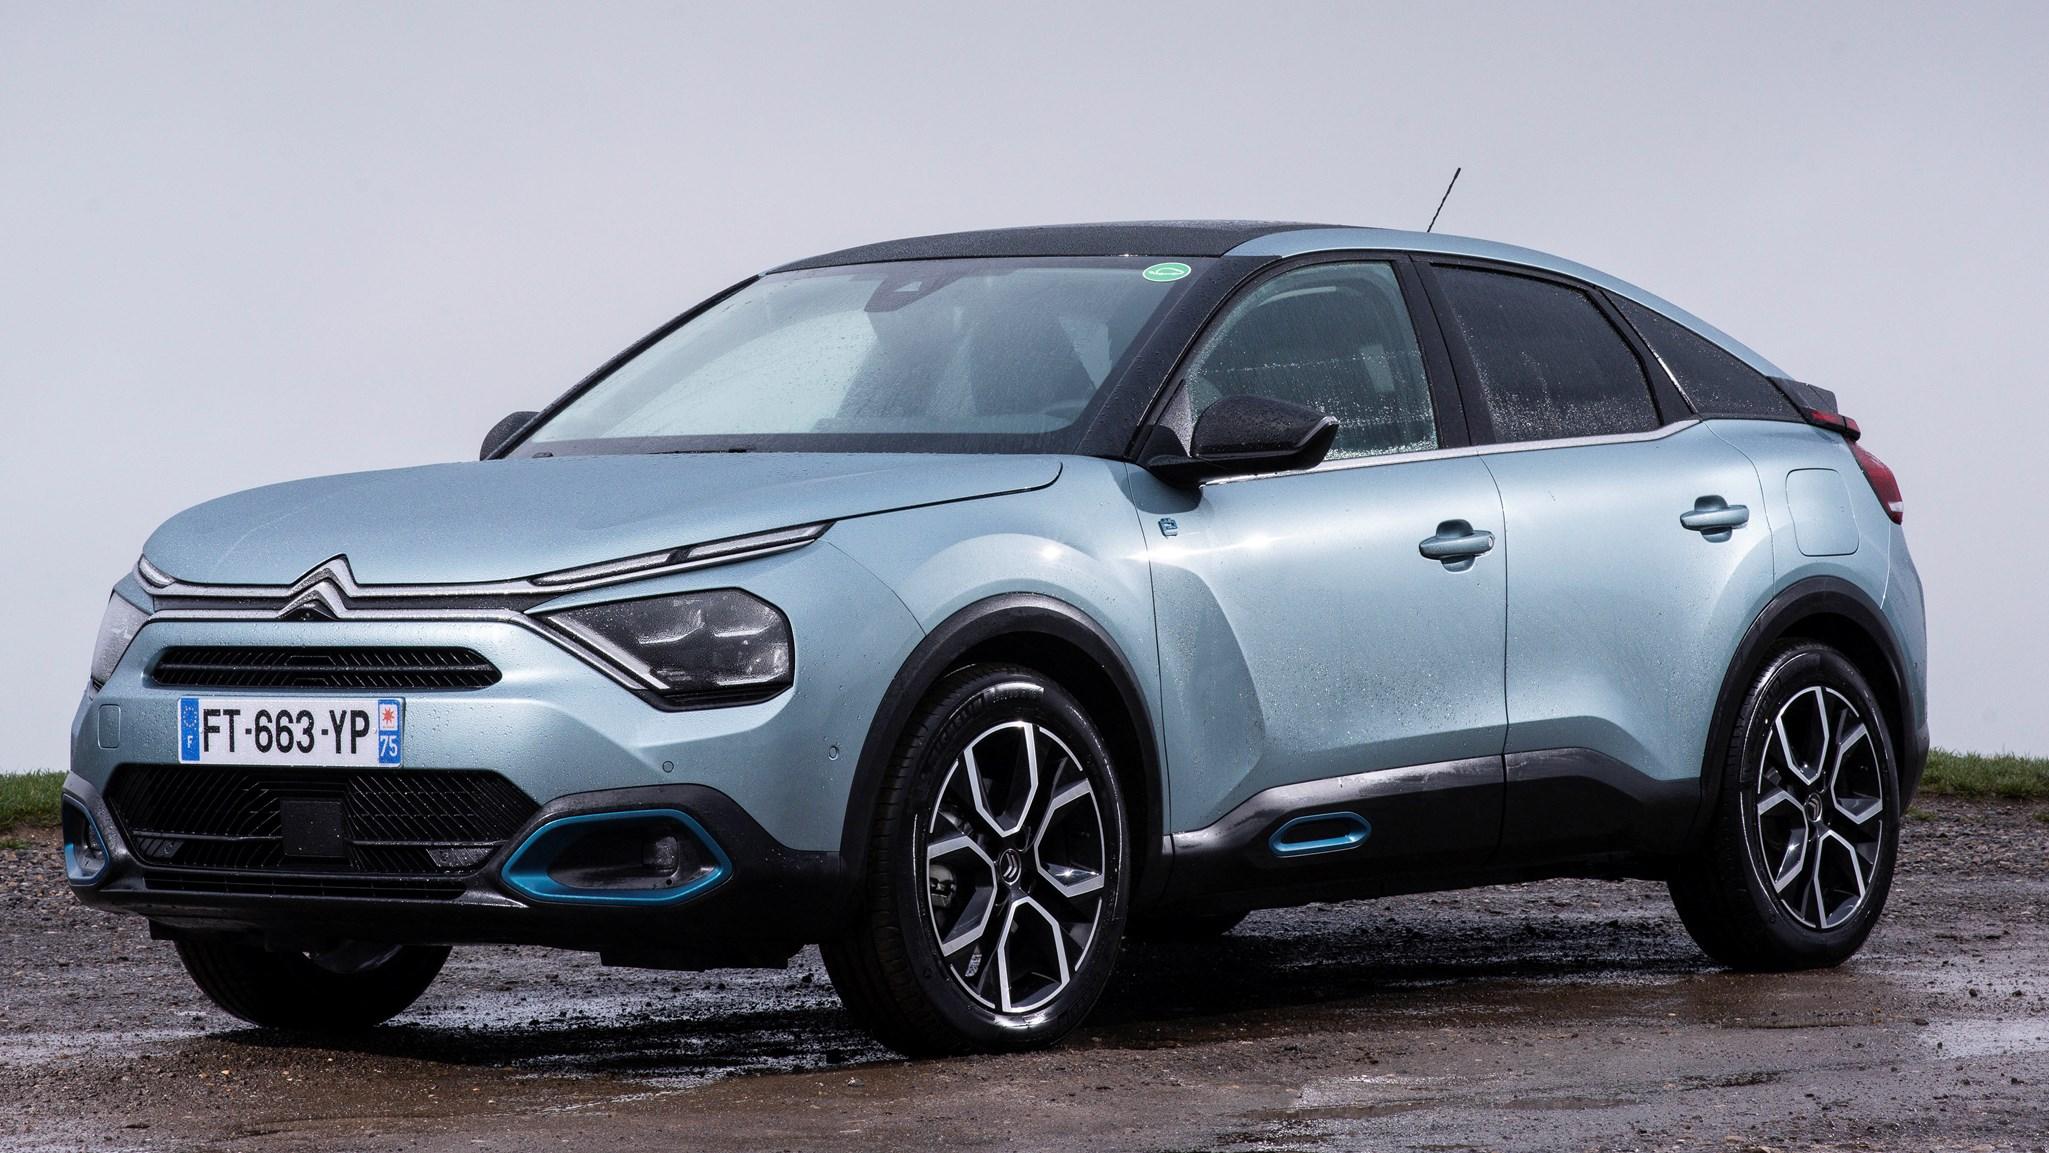 Citroen e-C4 Hatchback 100kw Shine Plus 50kWh Auto in stock